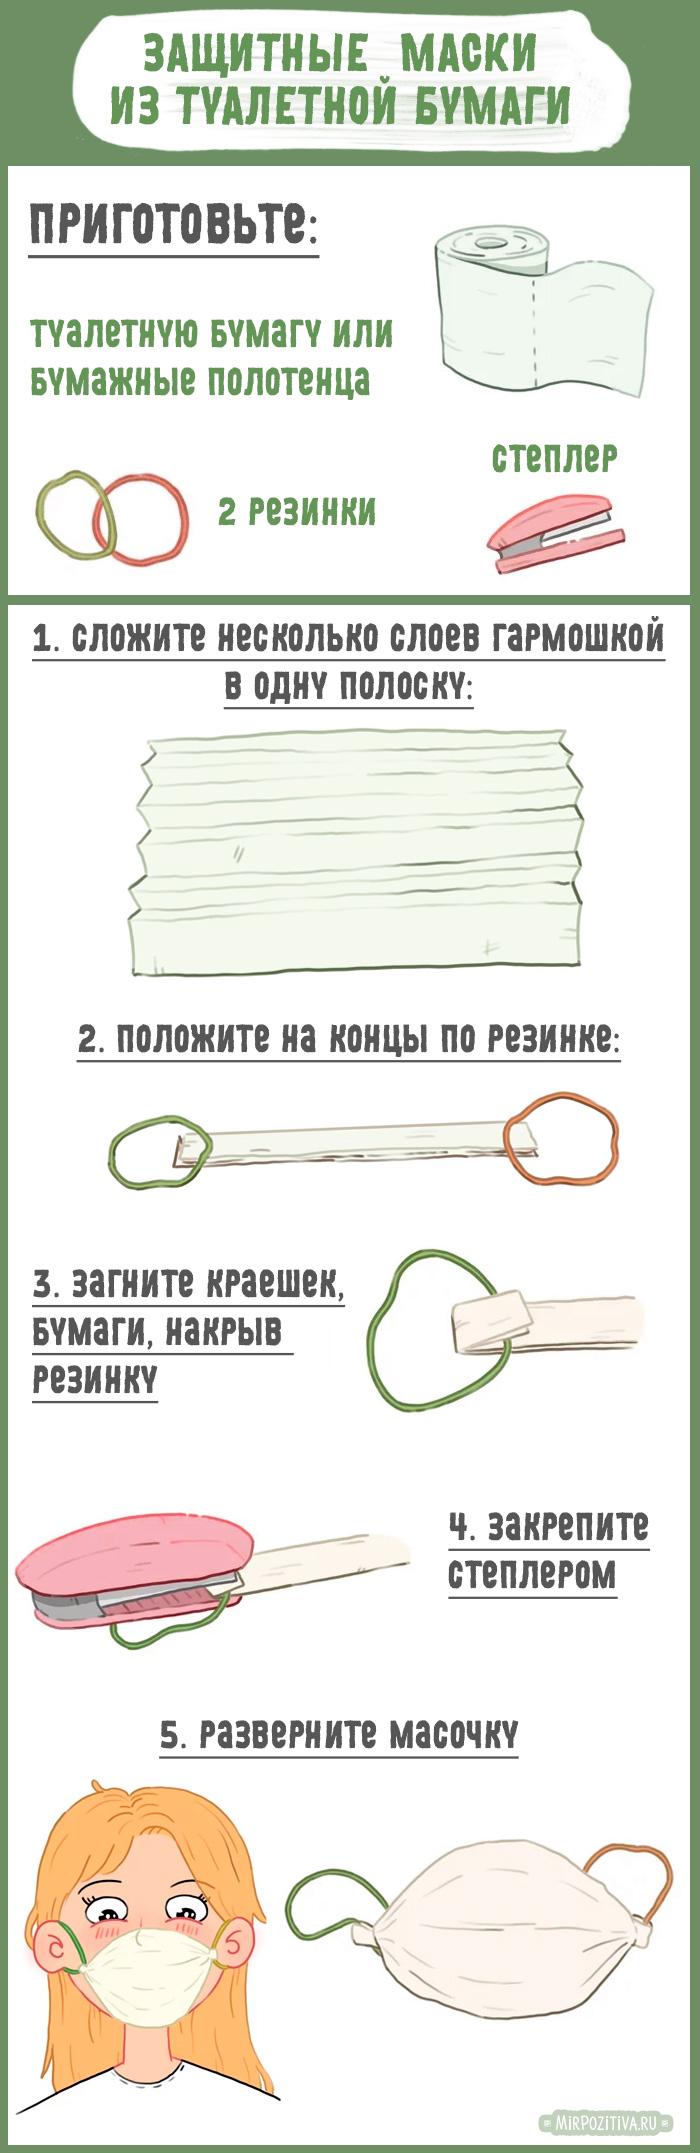 маска бумажная схема складывания